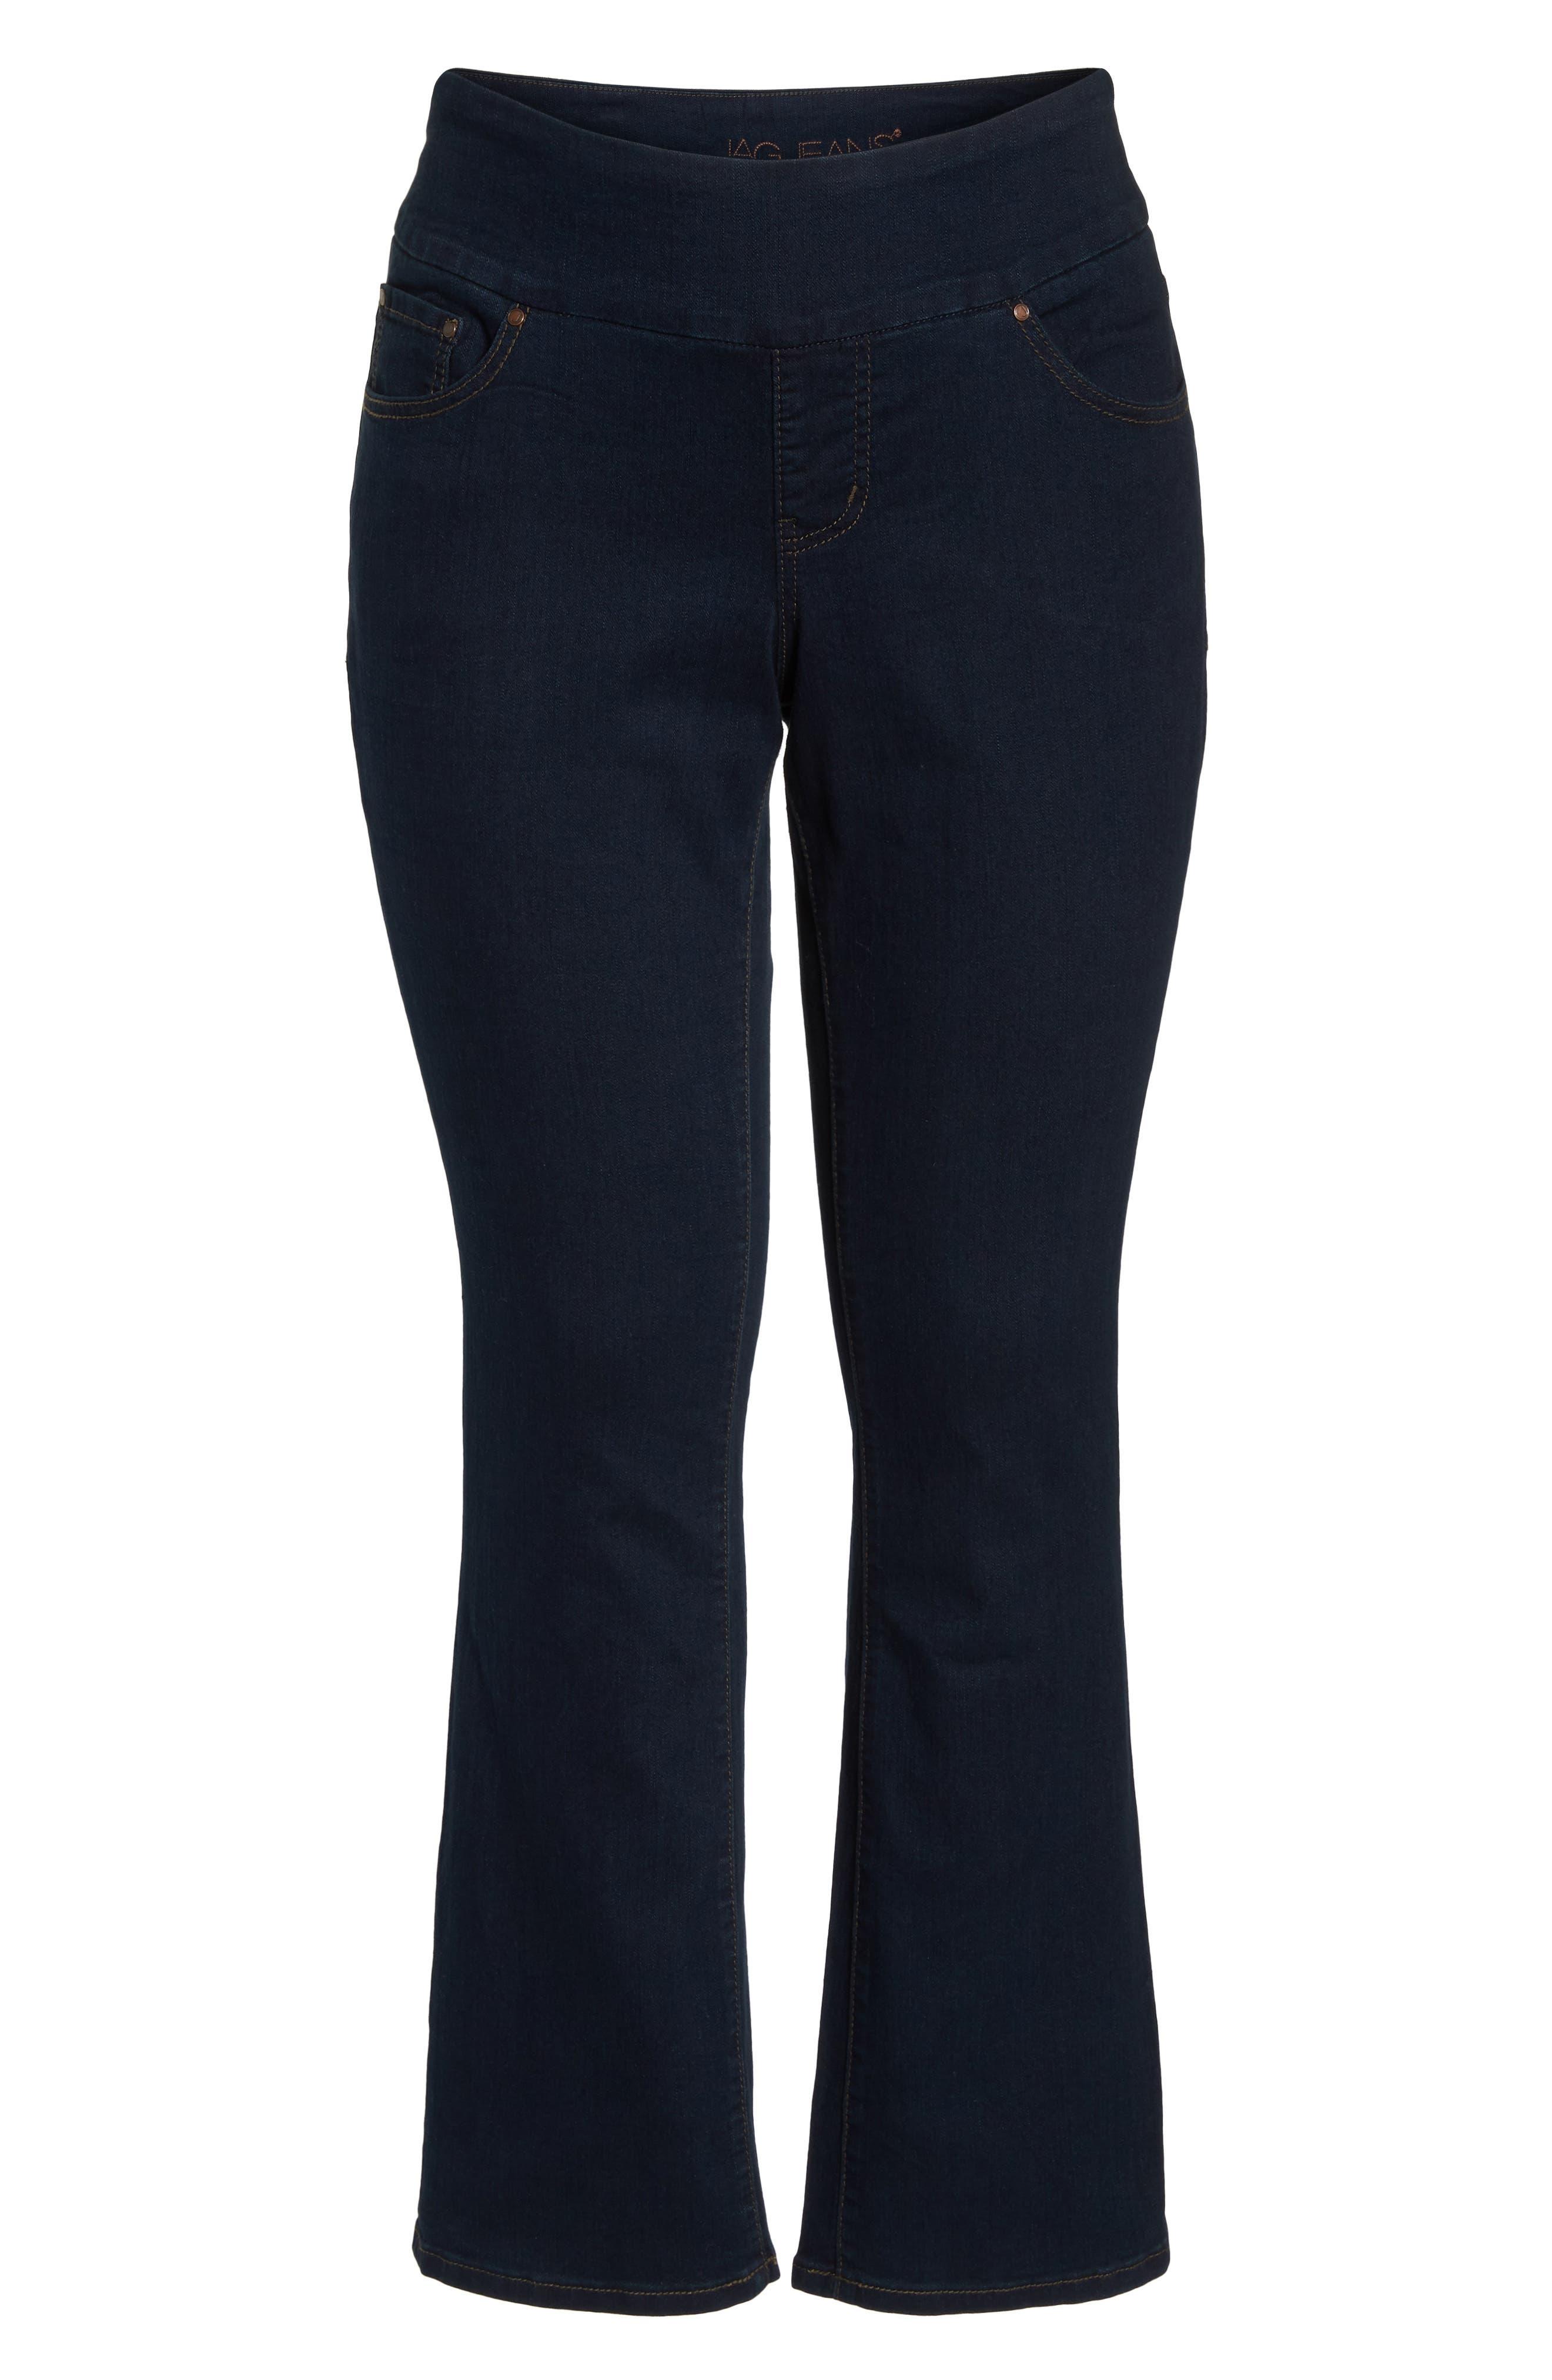 Peri Stretch Straight Leg Jeans,                             Alternate thumbnail 7, color,                             DARK INDIGO